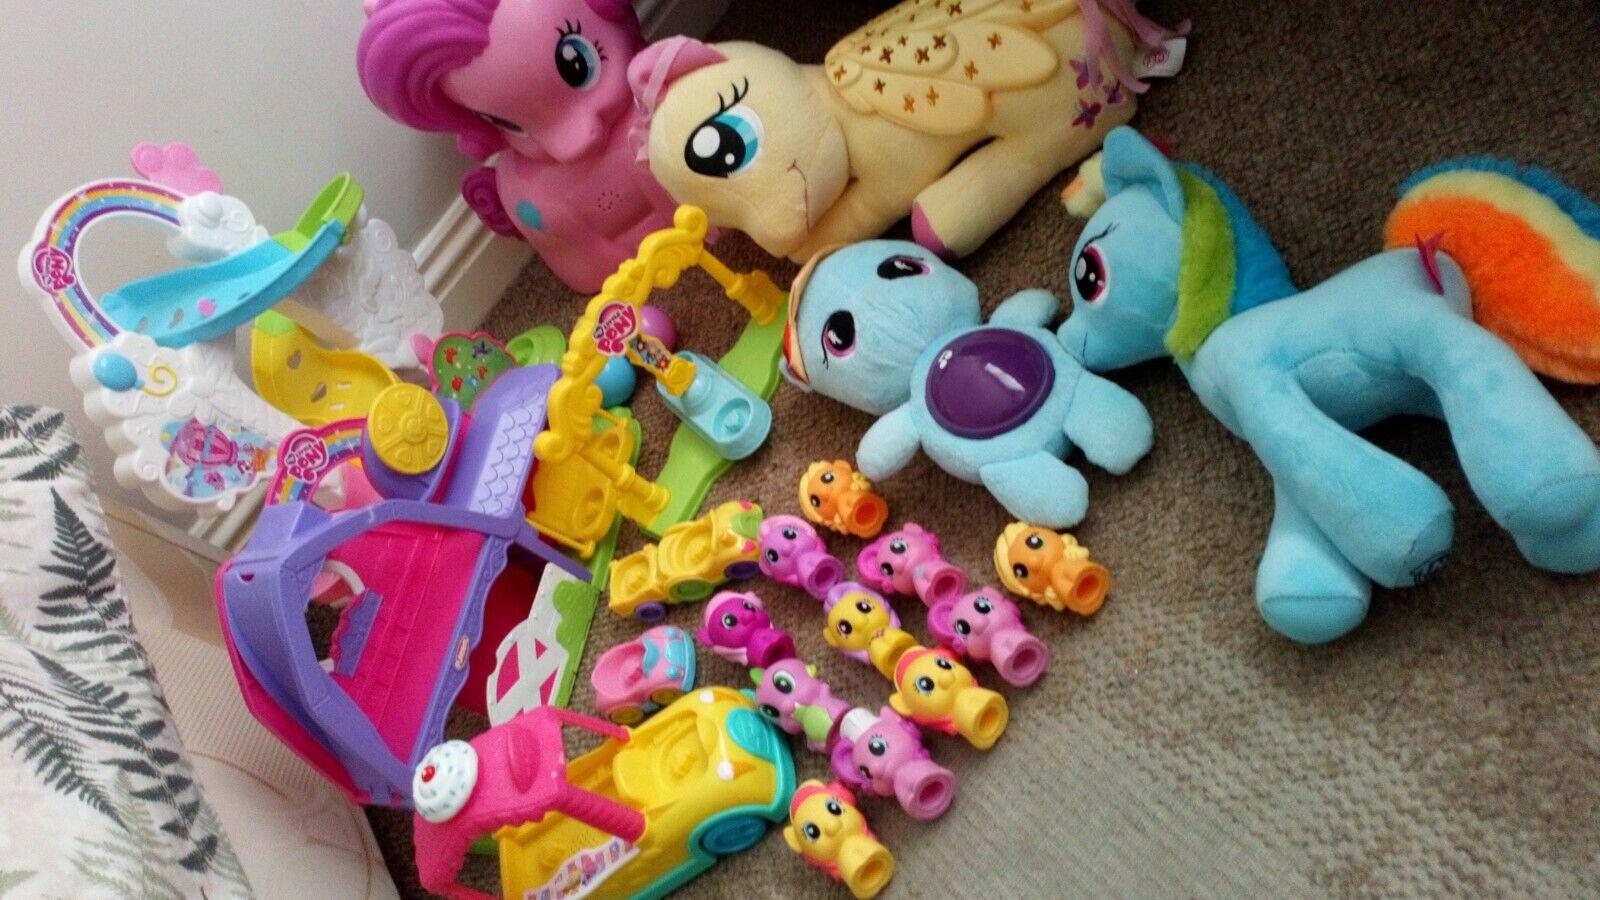 Playskool First My Little Pony Bundle pkus light up fluttershy night time Dash